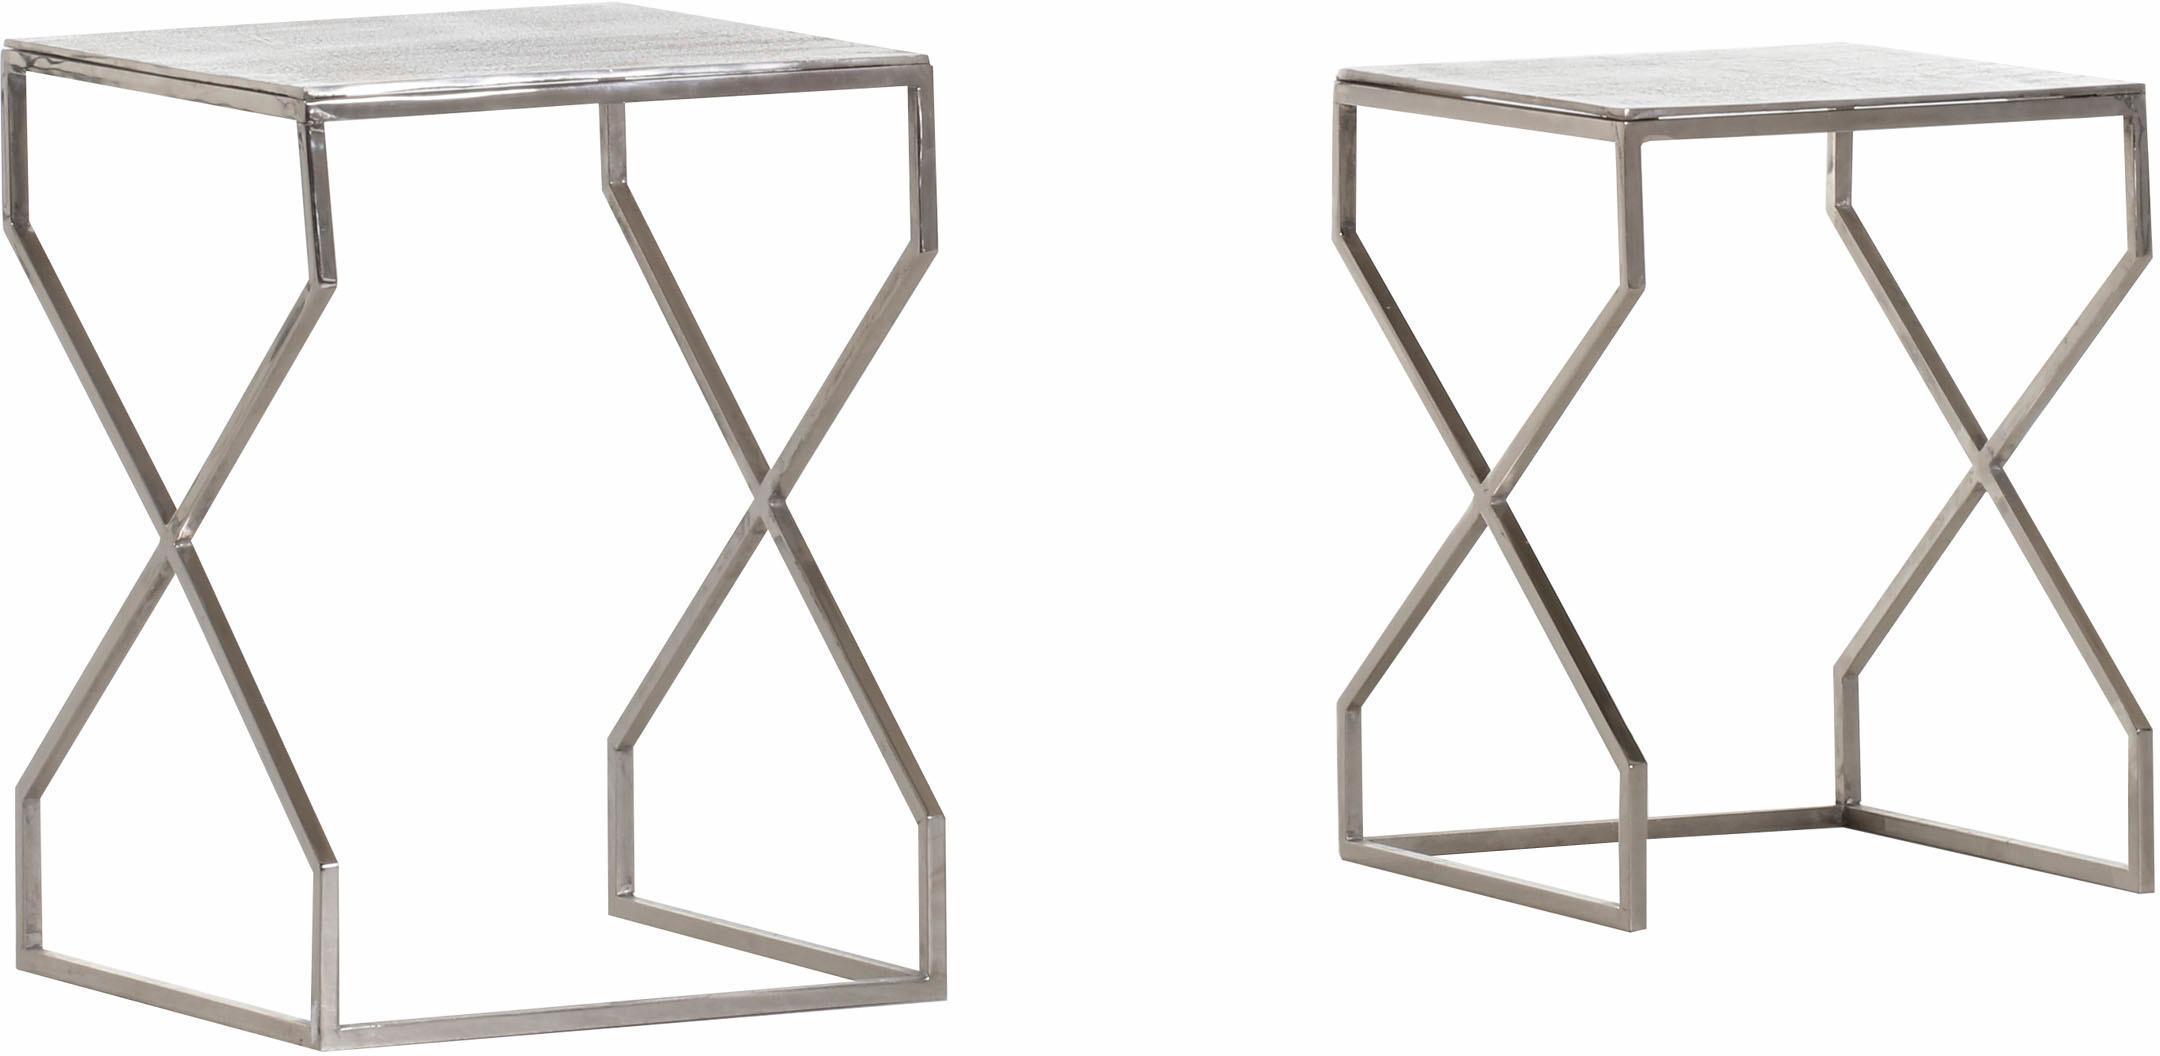 Gutmann Factory Beistelltisch Mix&Match, (Set, 2 St.) grau Beistelltische Tische